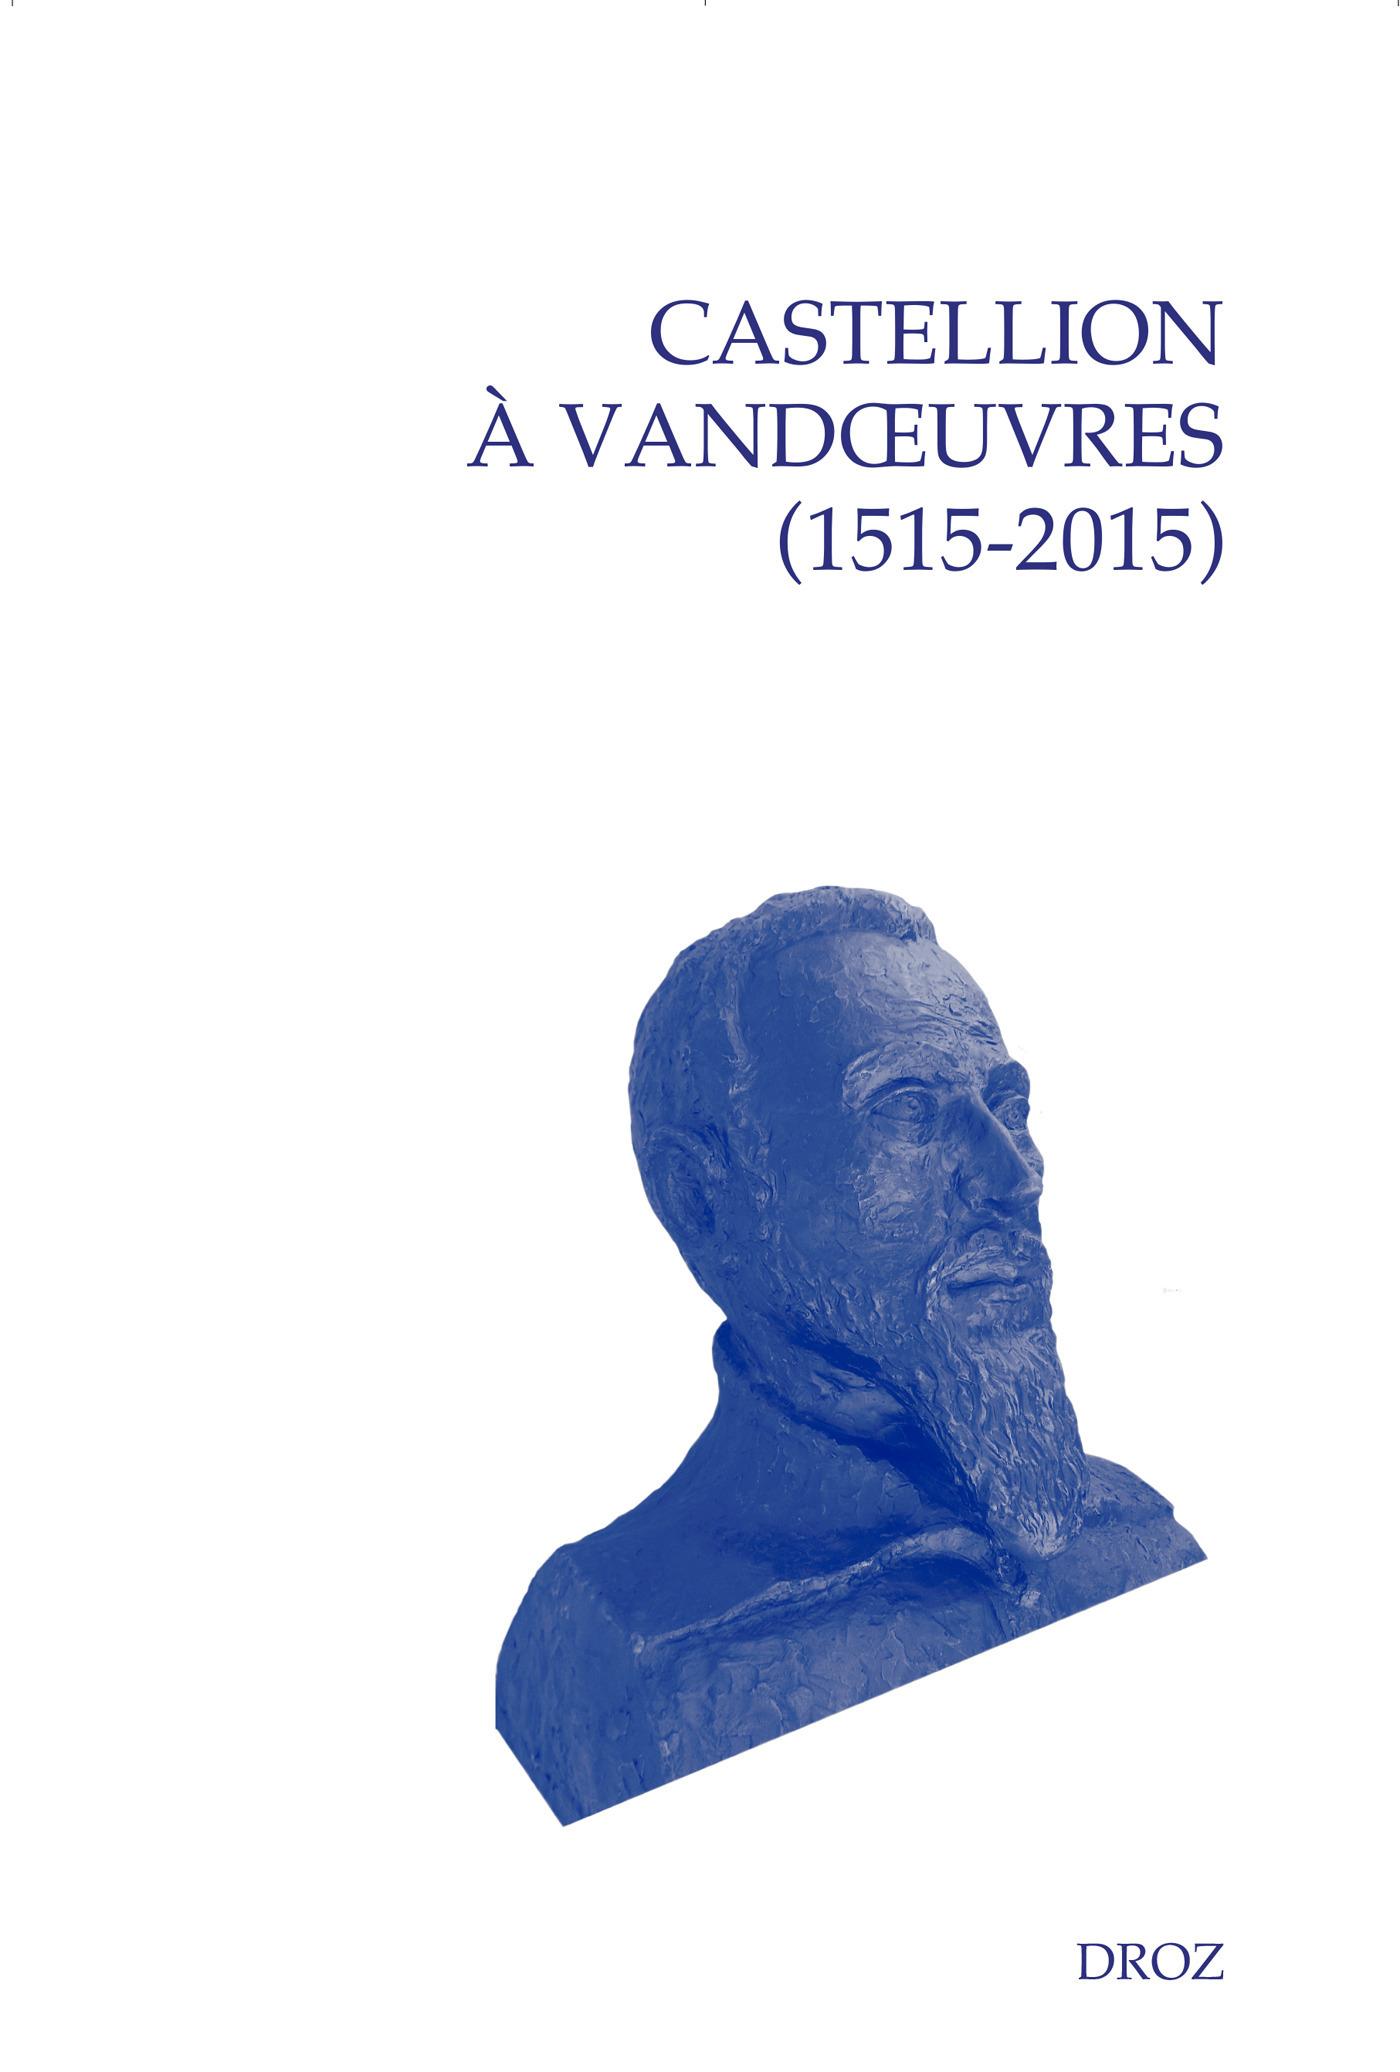 Castellion a vanoeuvres (1515-2015)